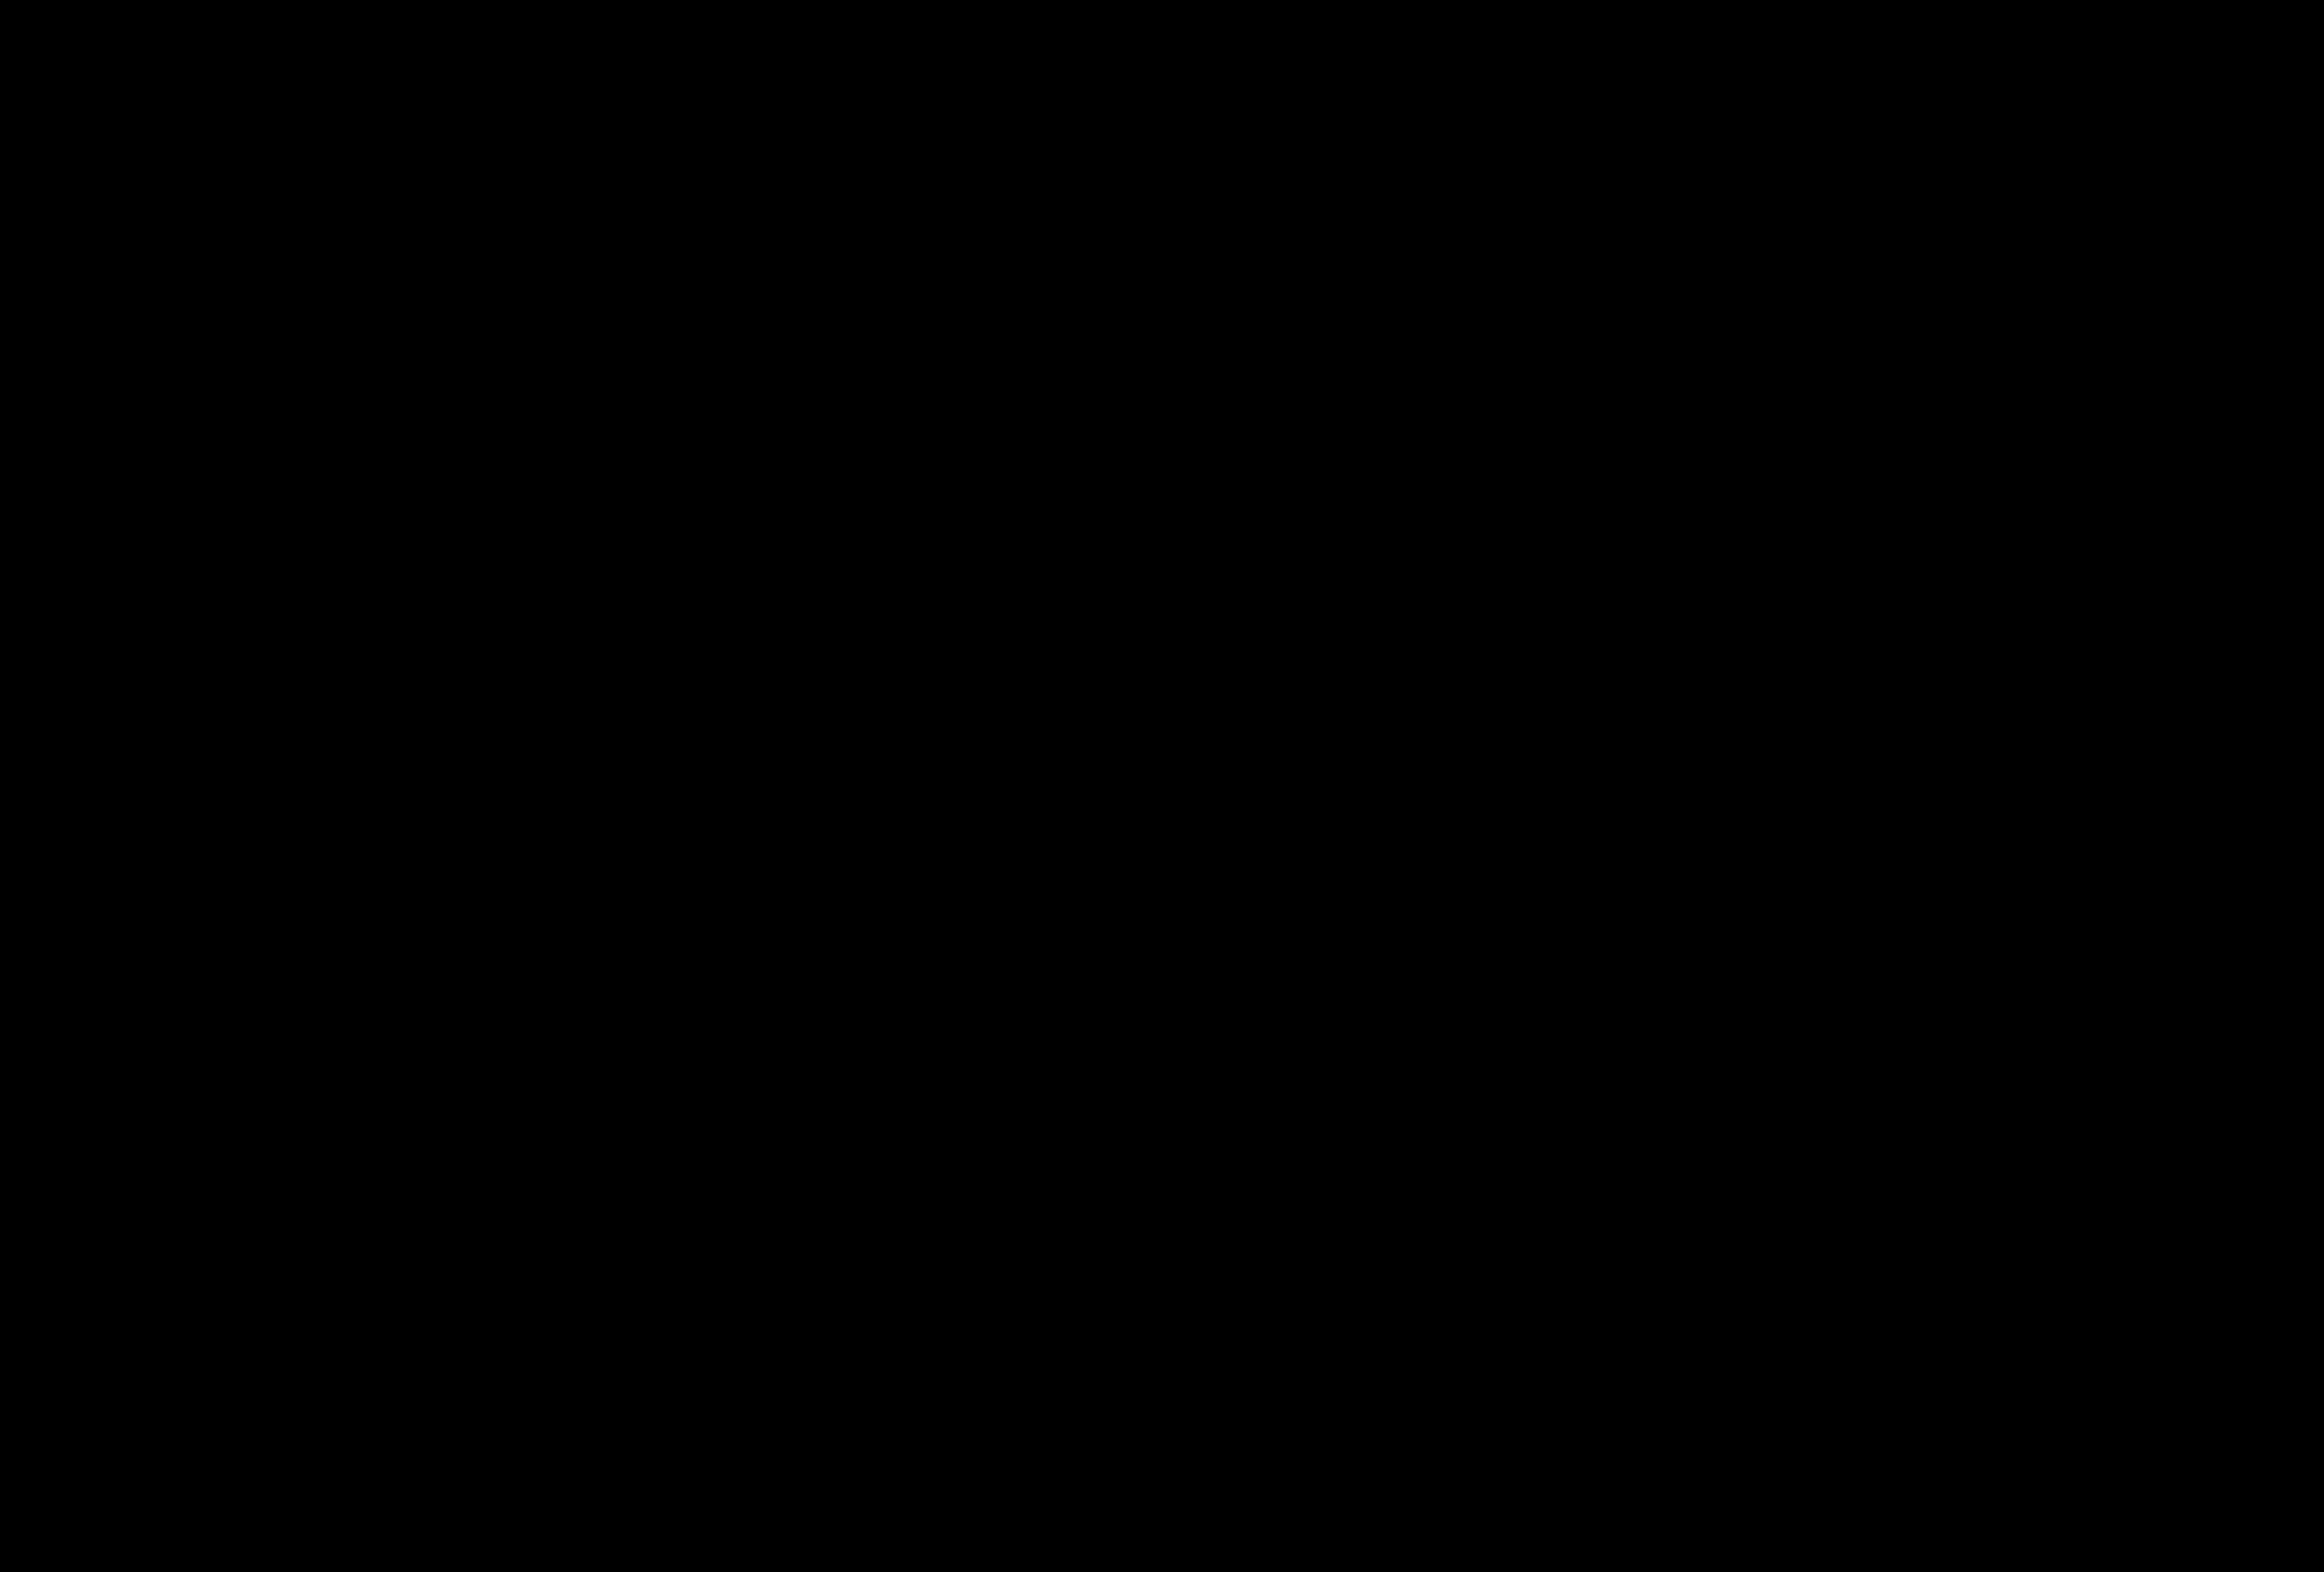 Cindy-Popp-branding-2018-03.png